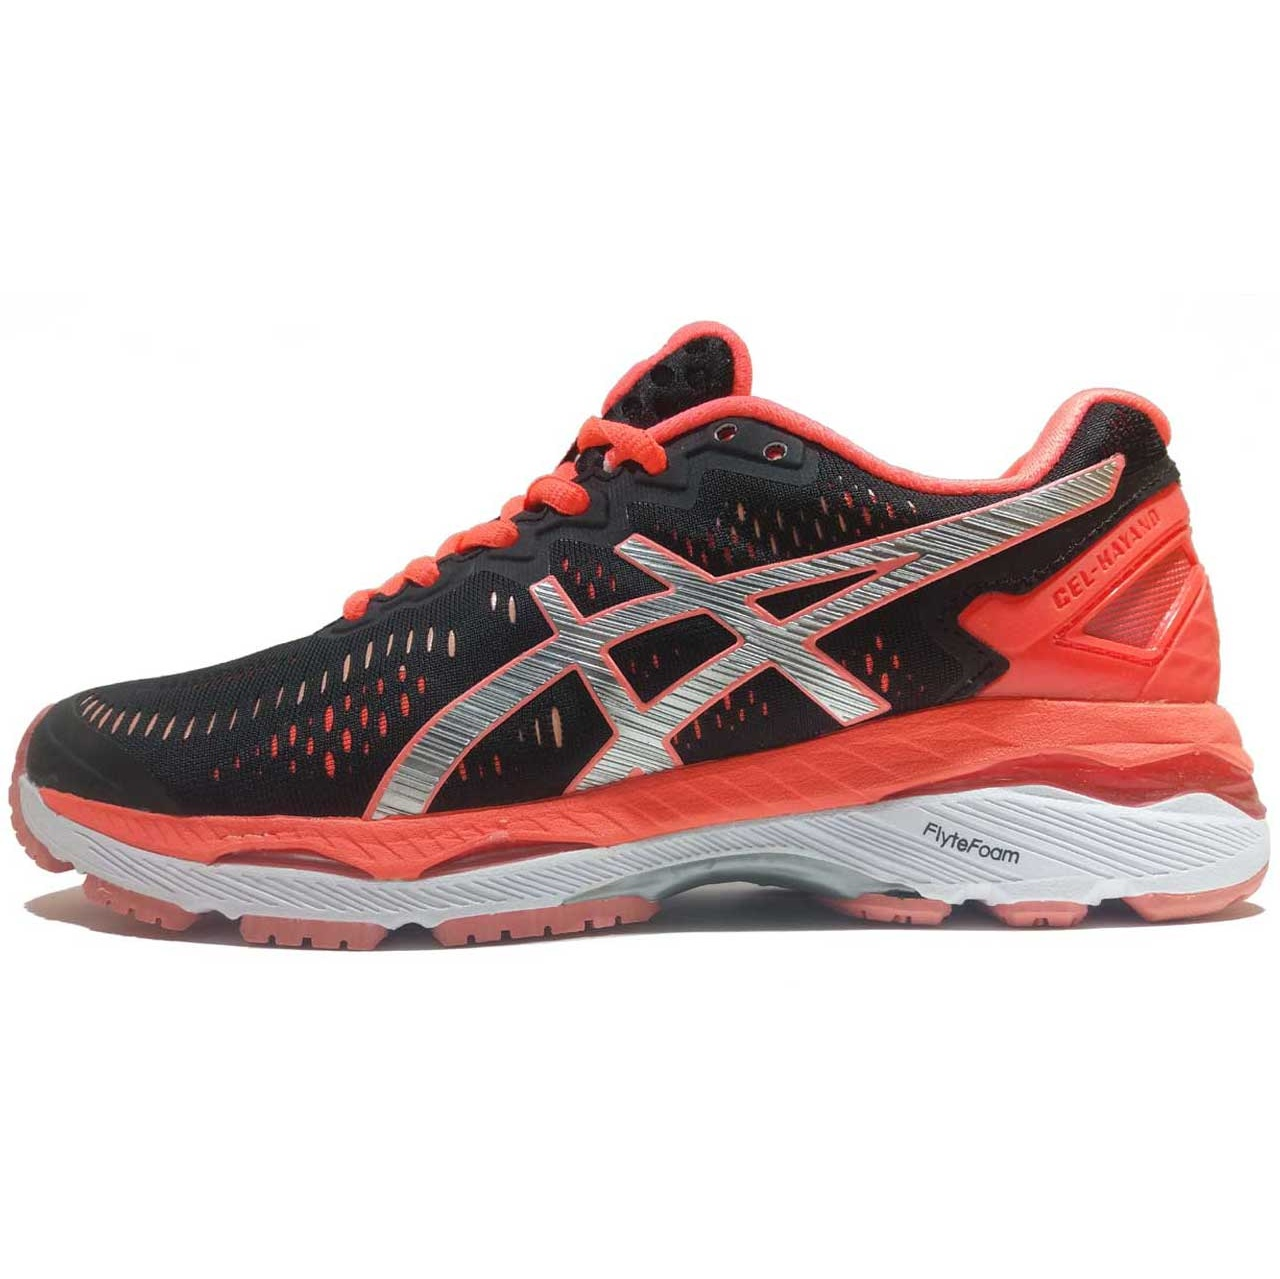 کفش مخصوص دویدن زنانه مدل kayana23 9093/23